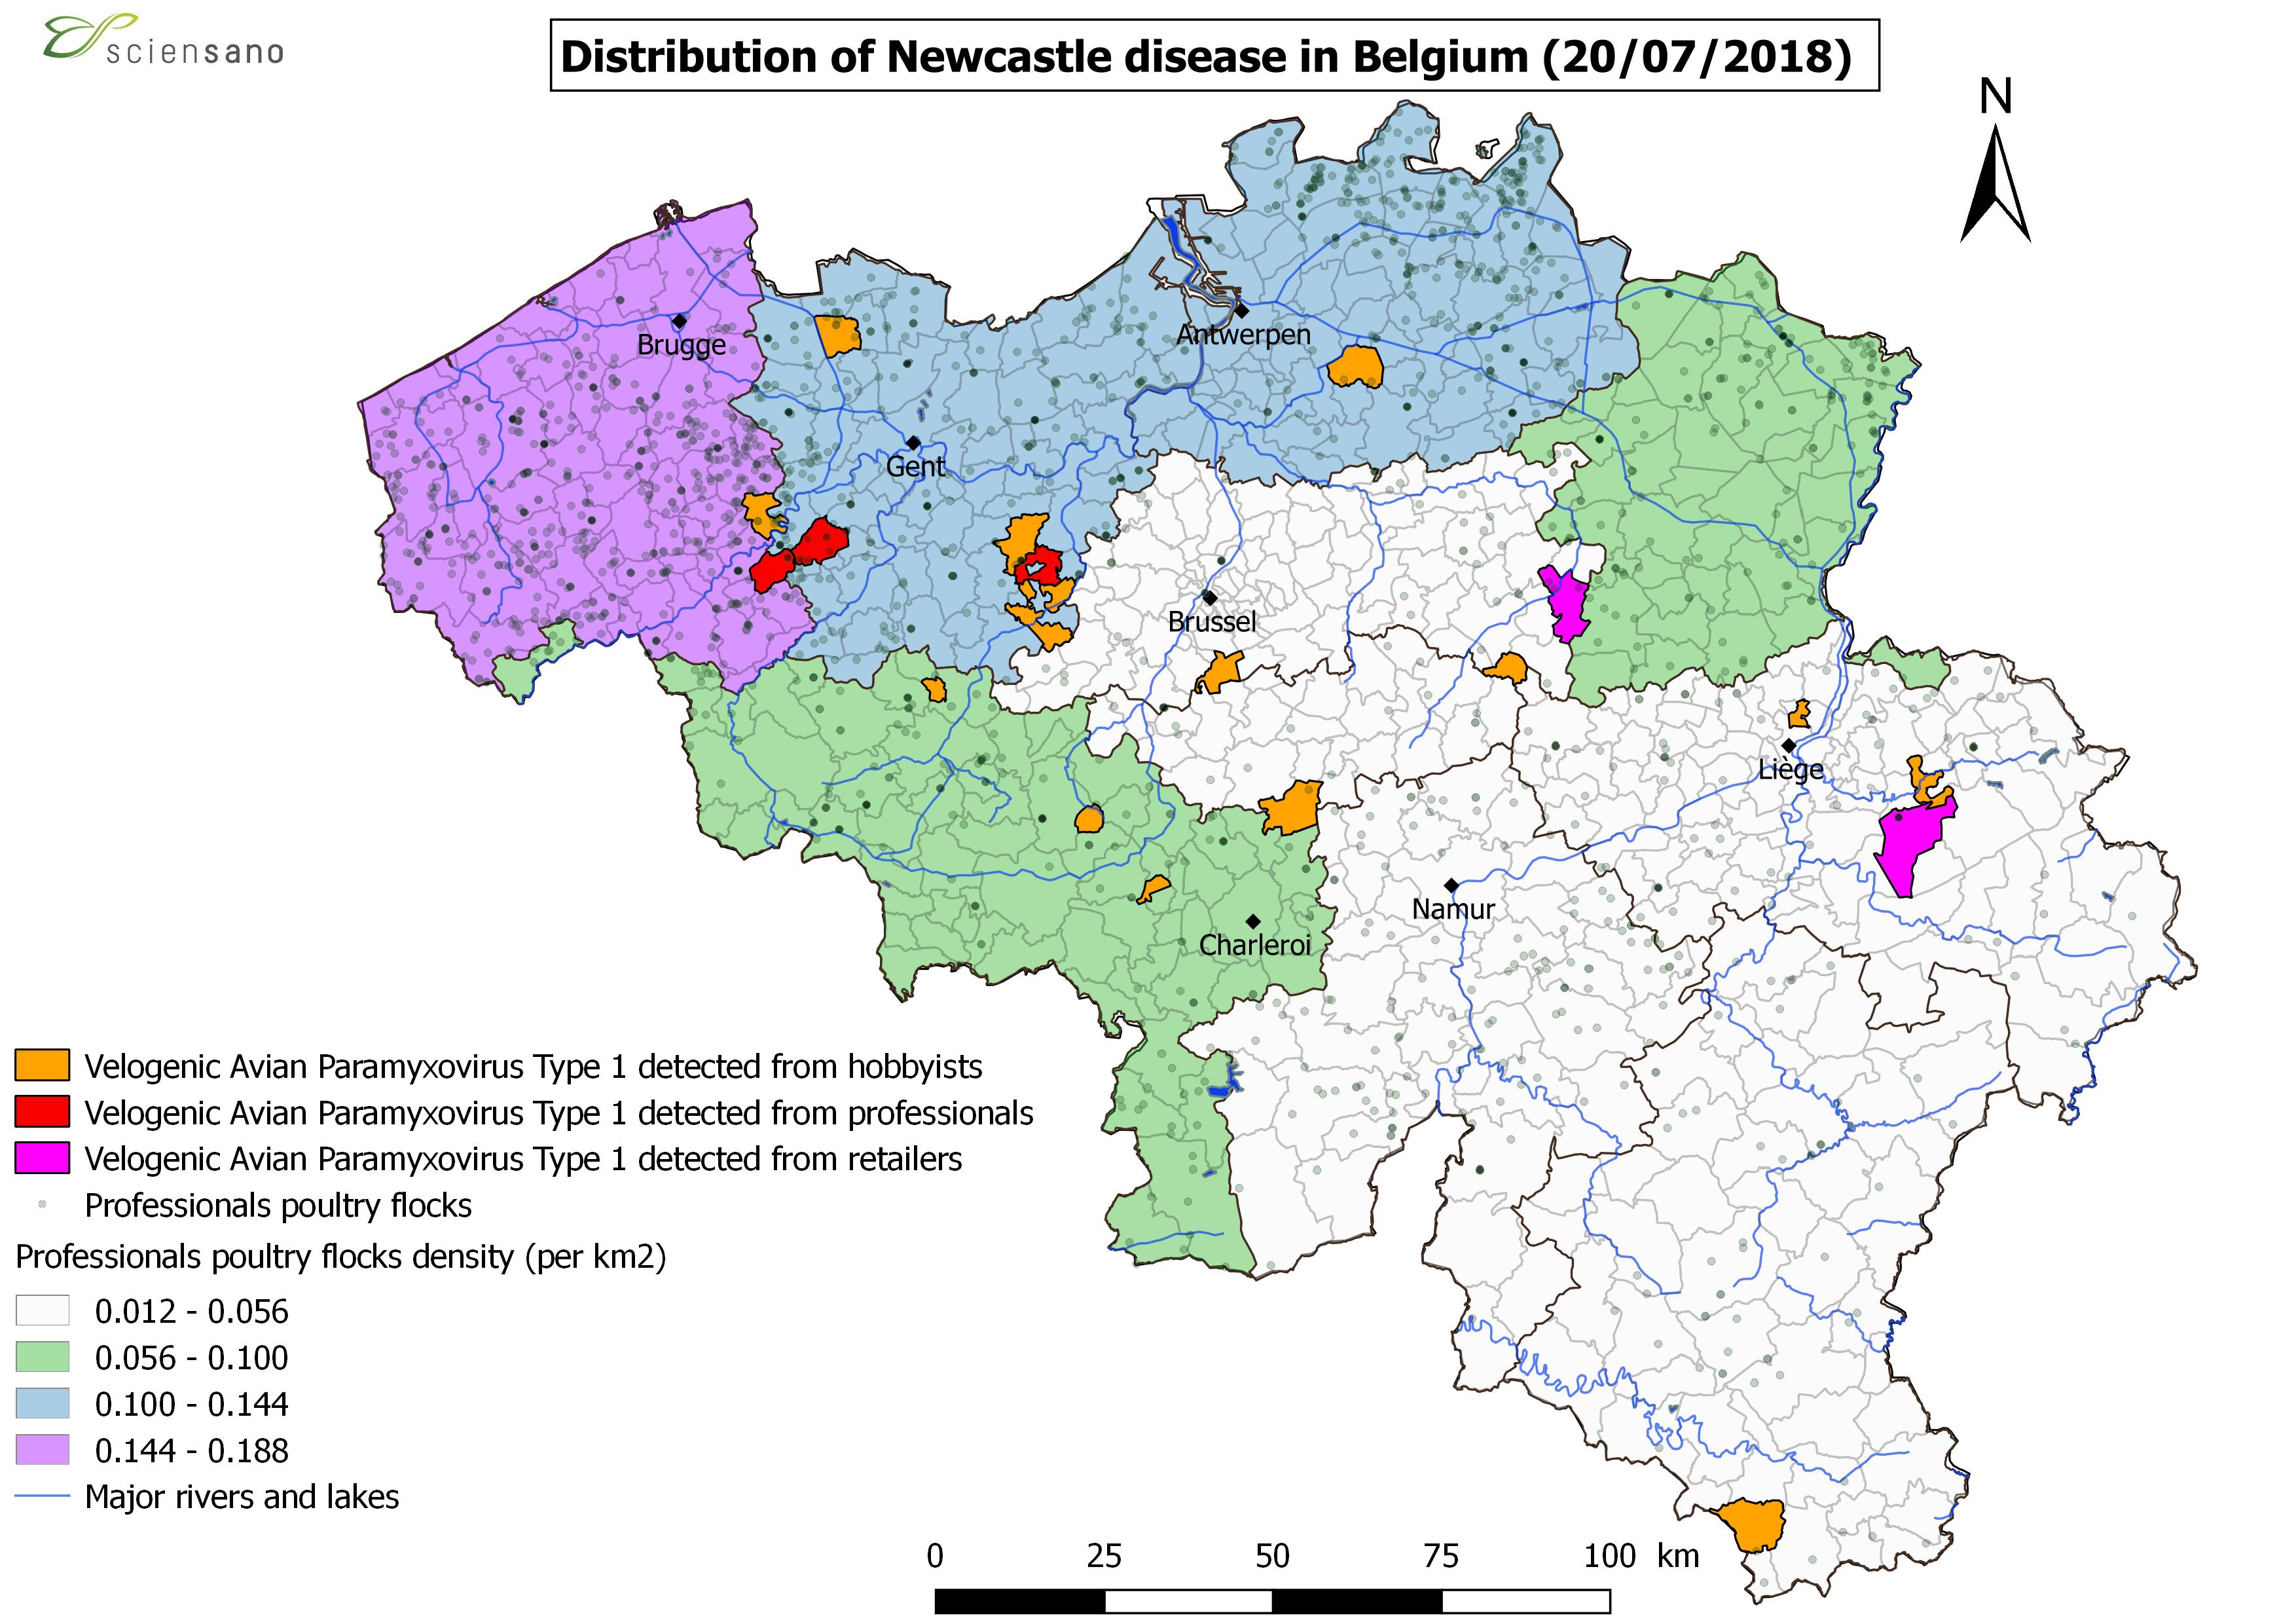 Distribution of Newcastle disease in Belgium (20/07/2018)